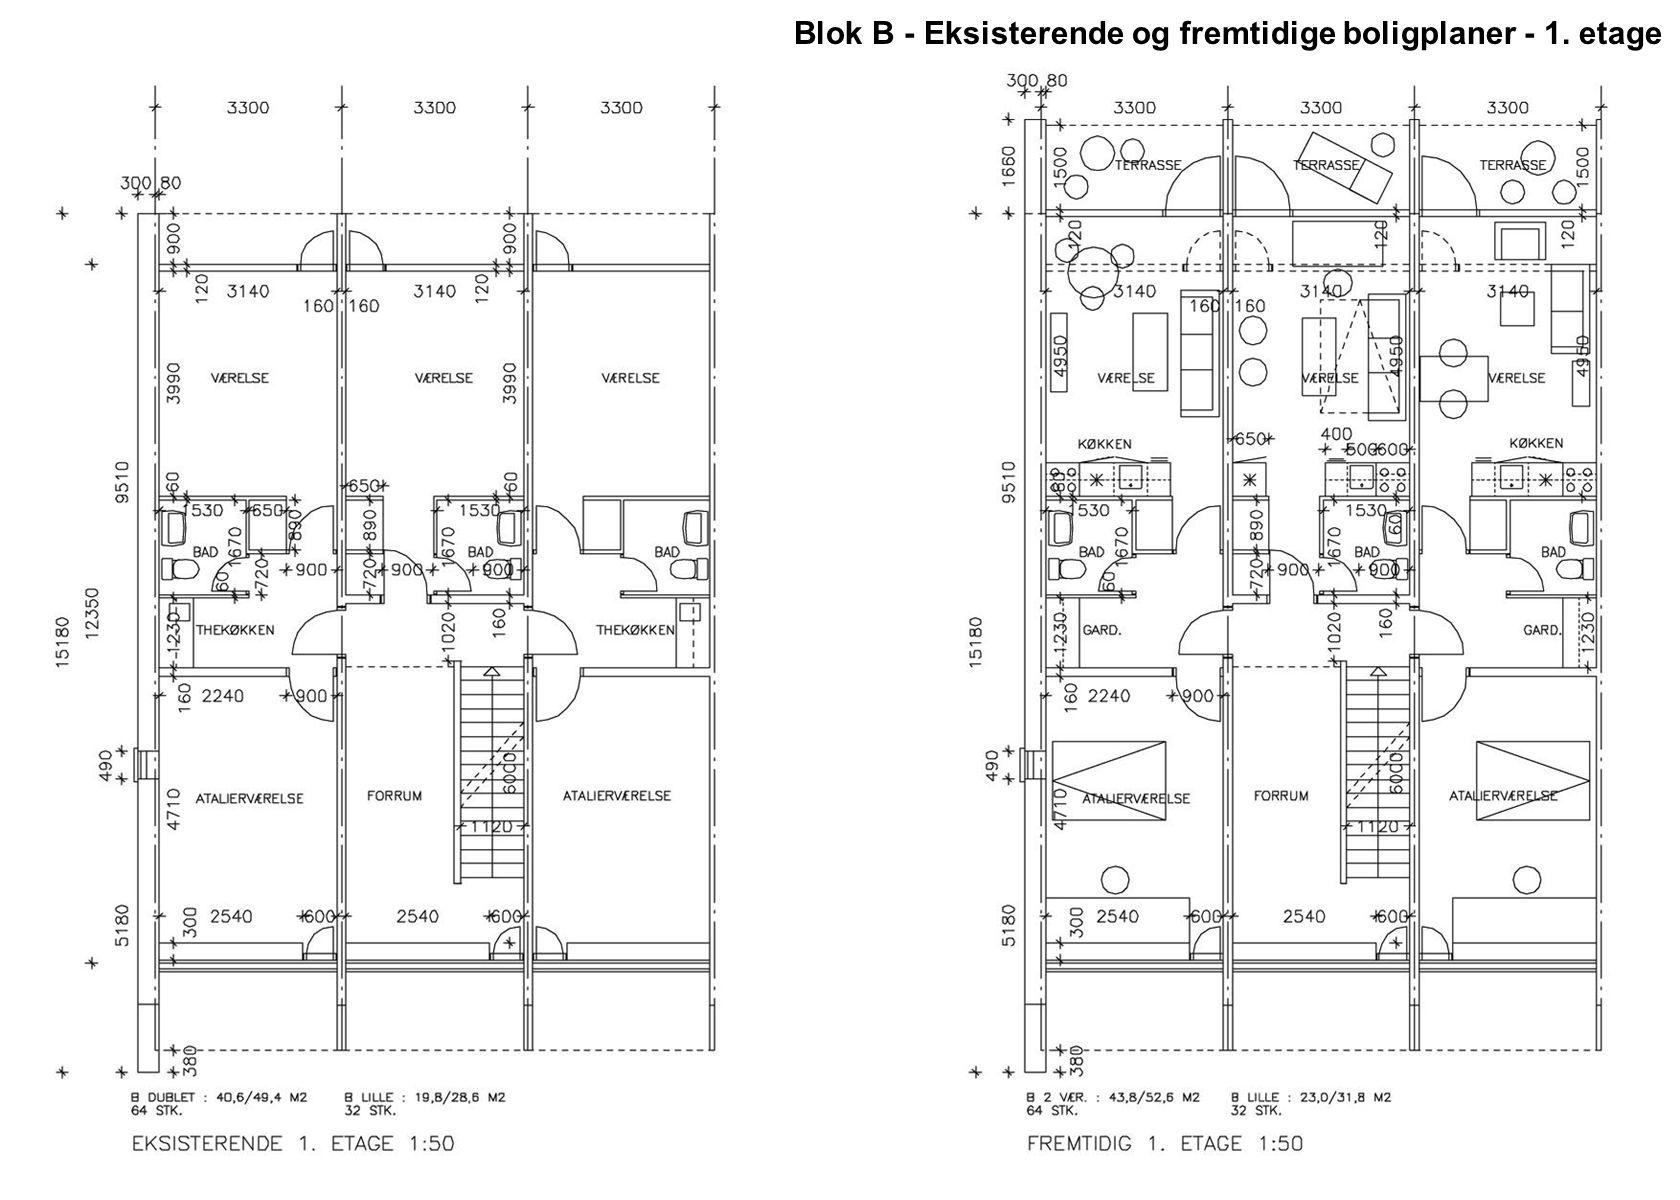 Blok B - Eksisterende og fremtidige boligplaner - 1. etage